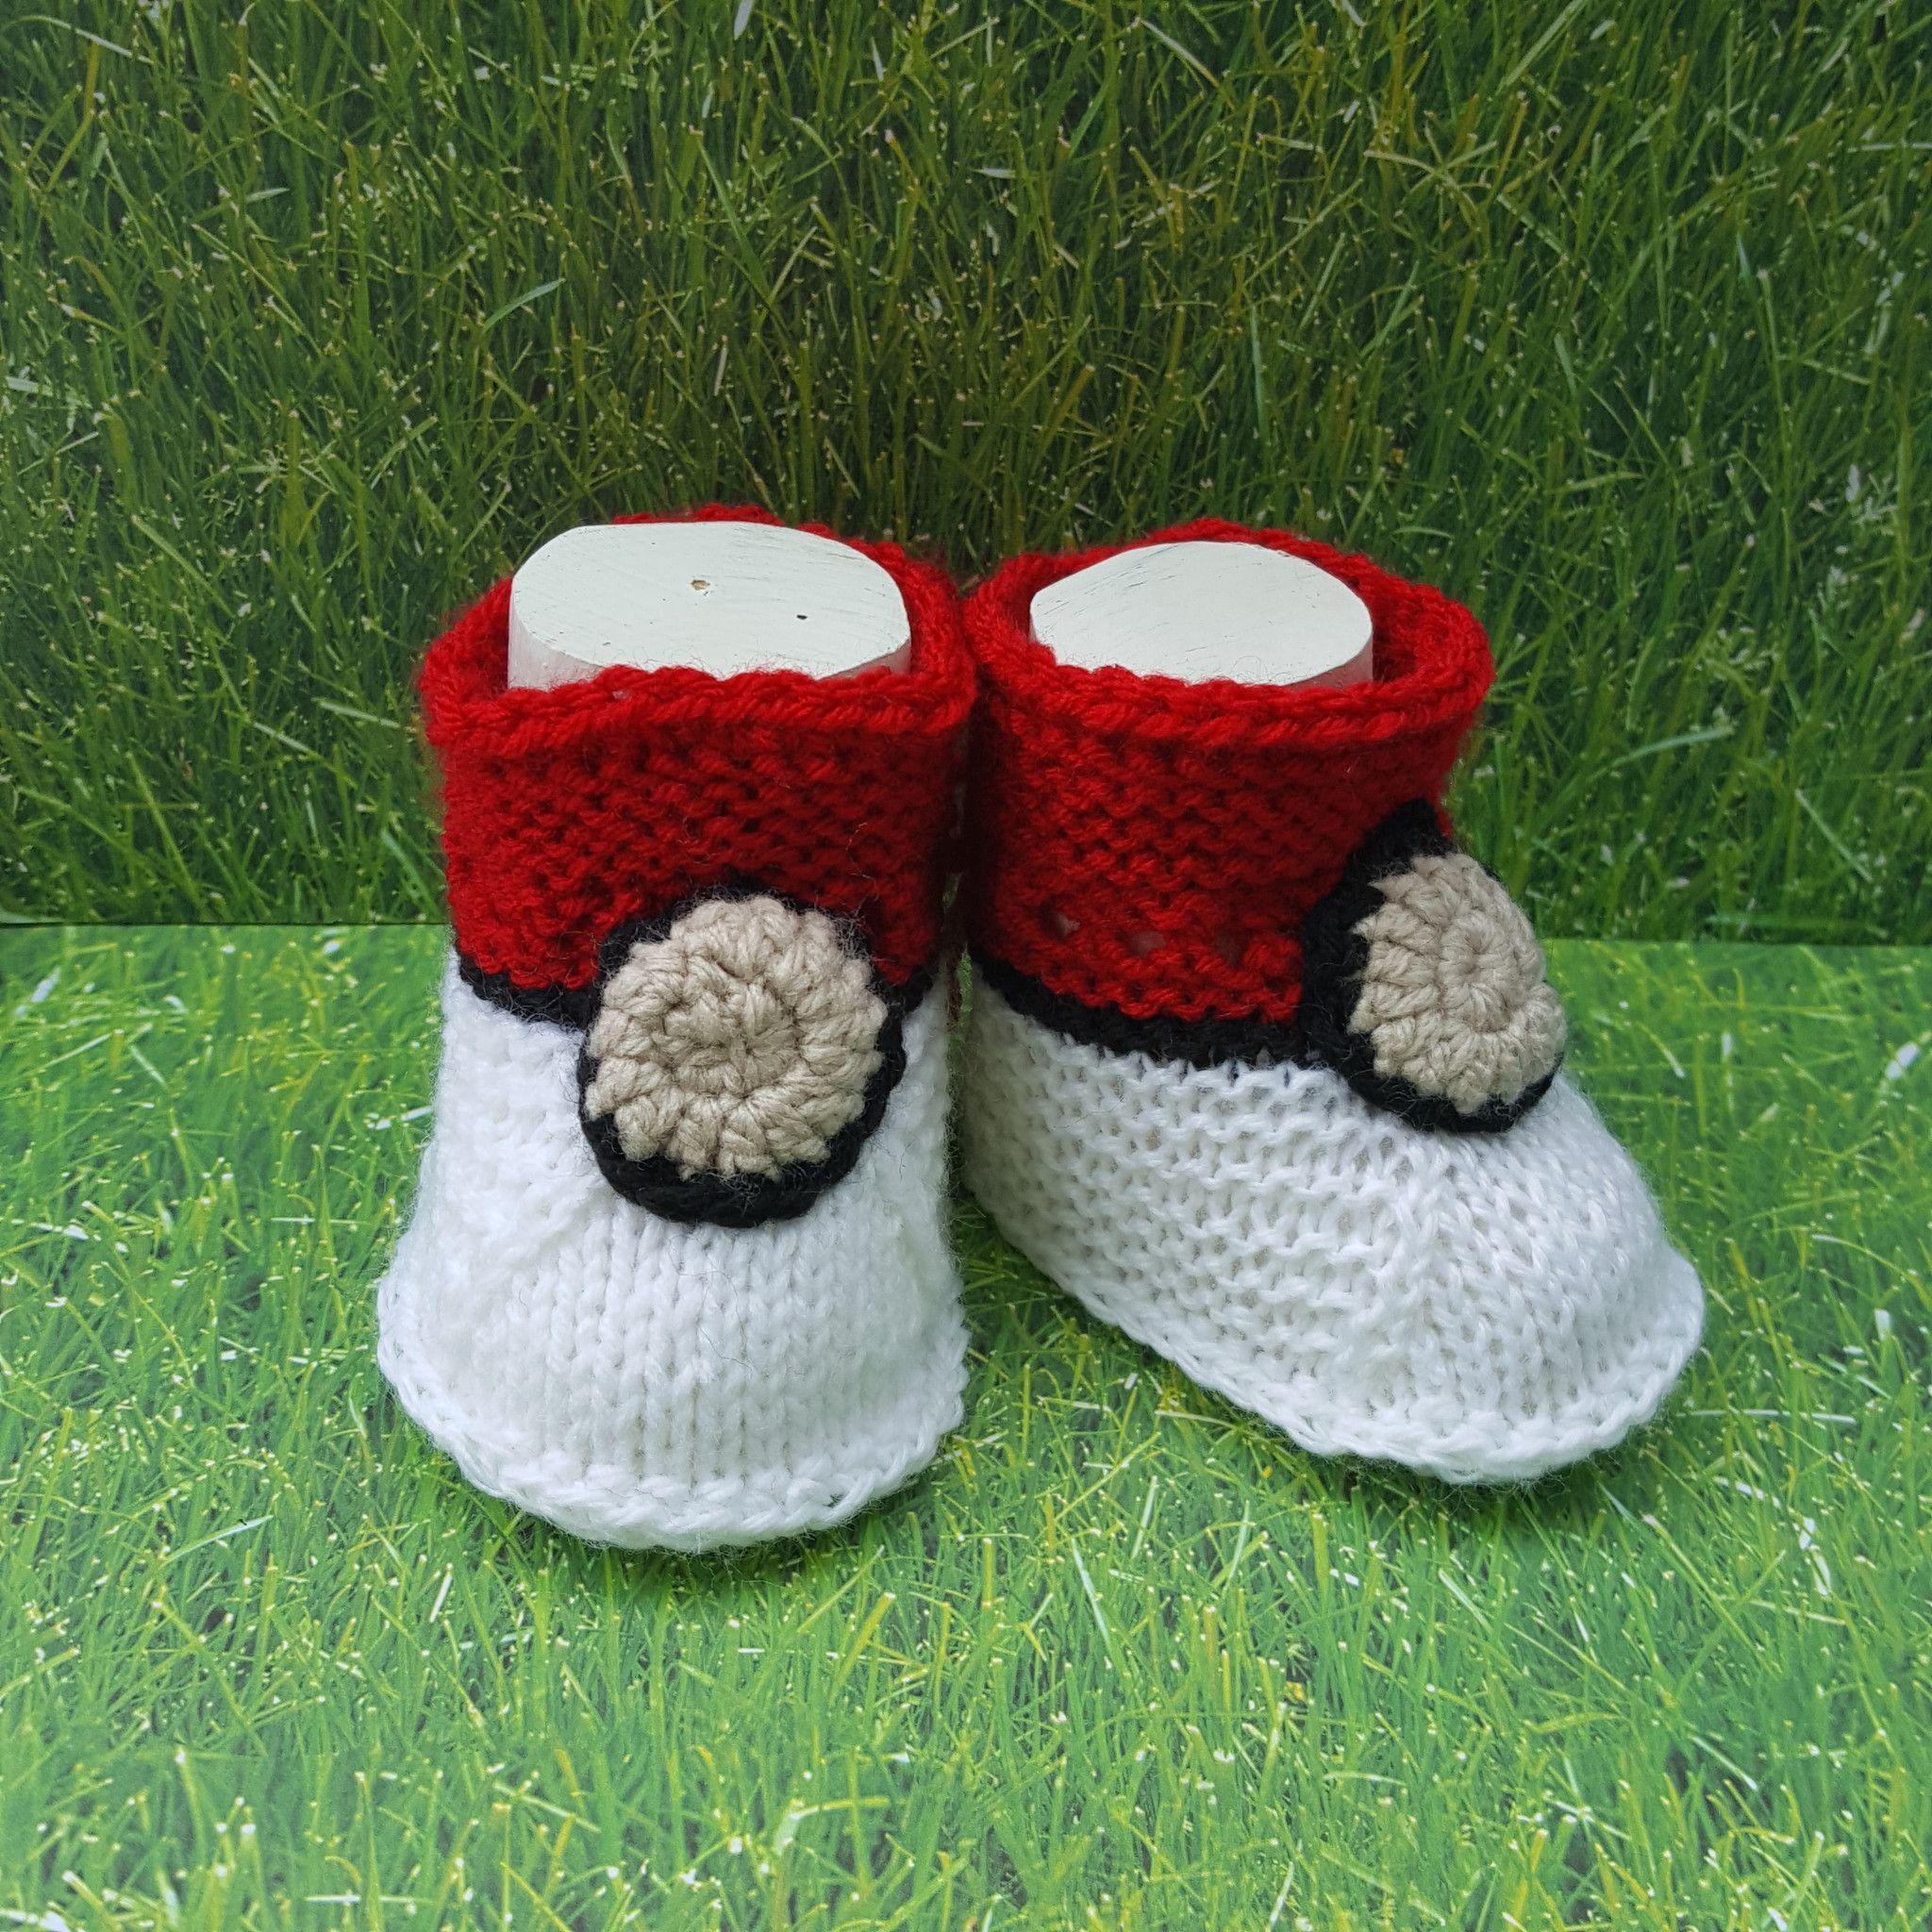 Knitted baby booties Pokemon Go yarn crafty fun